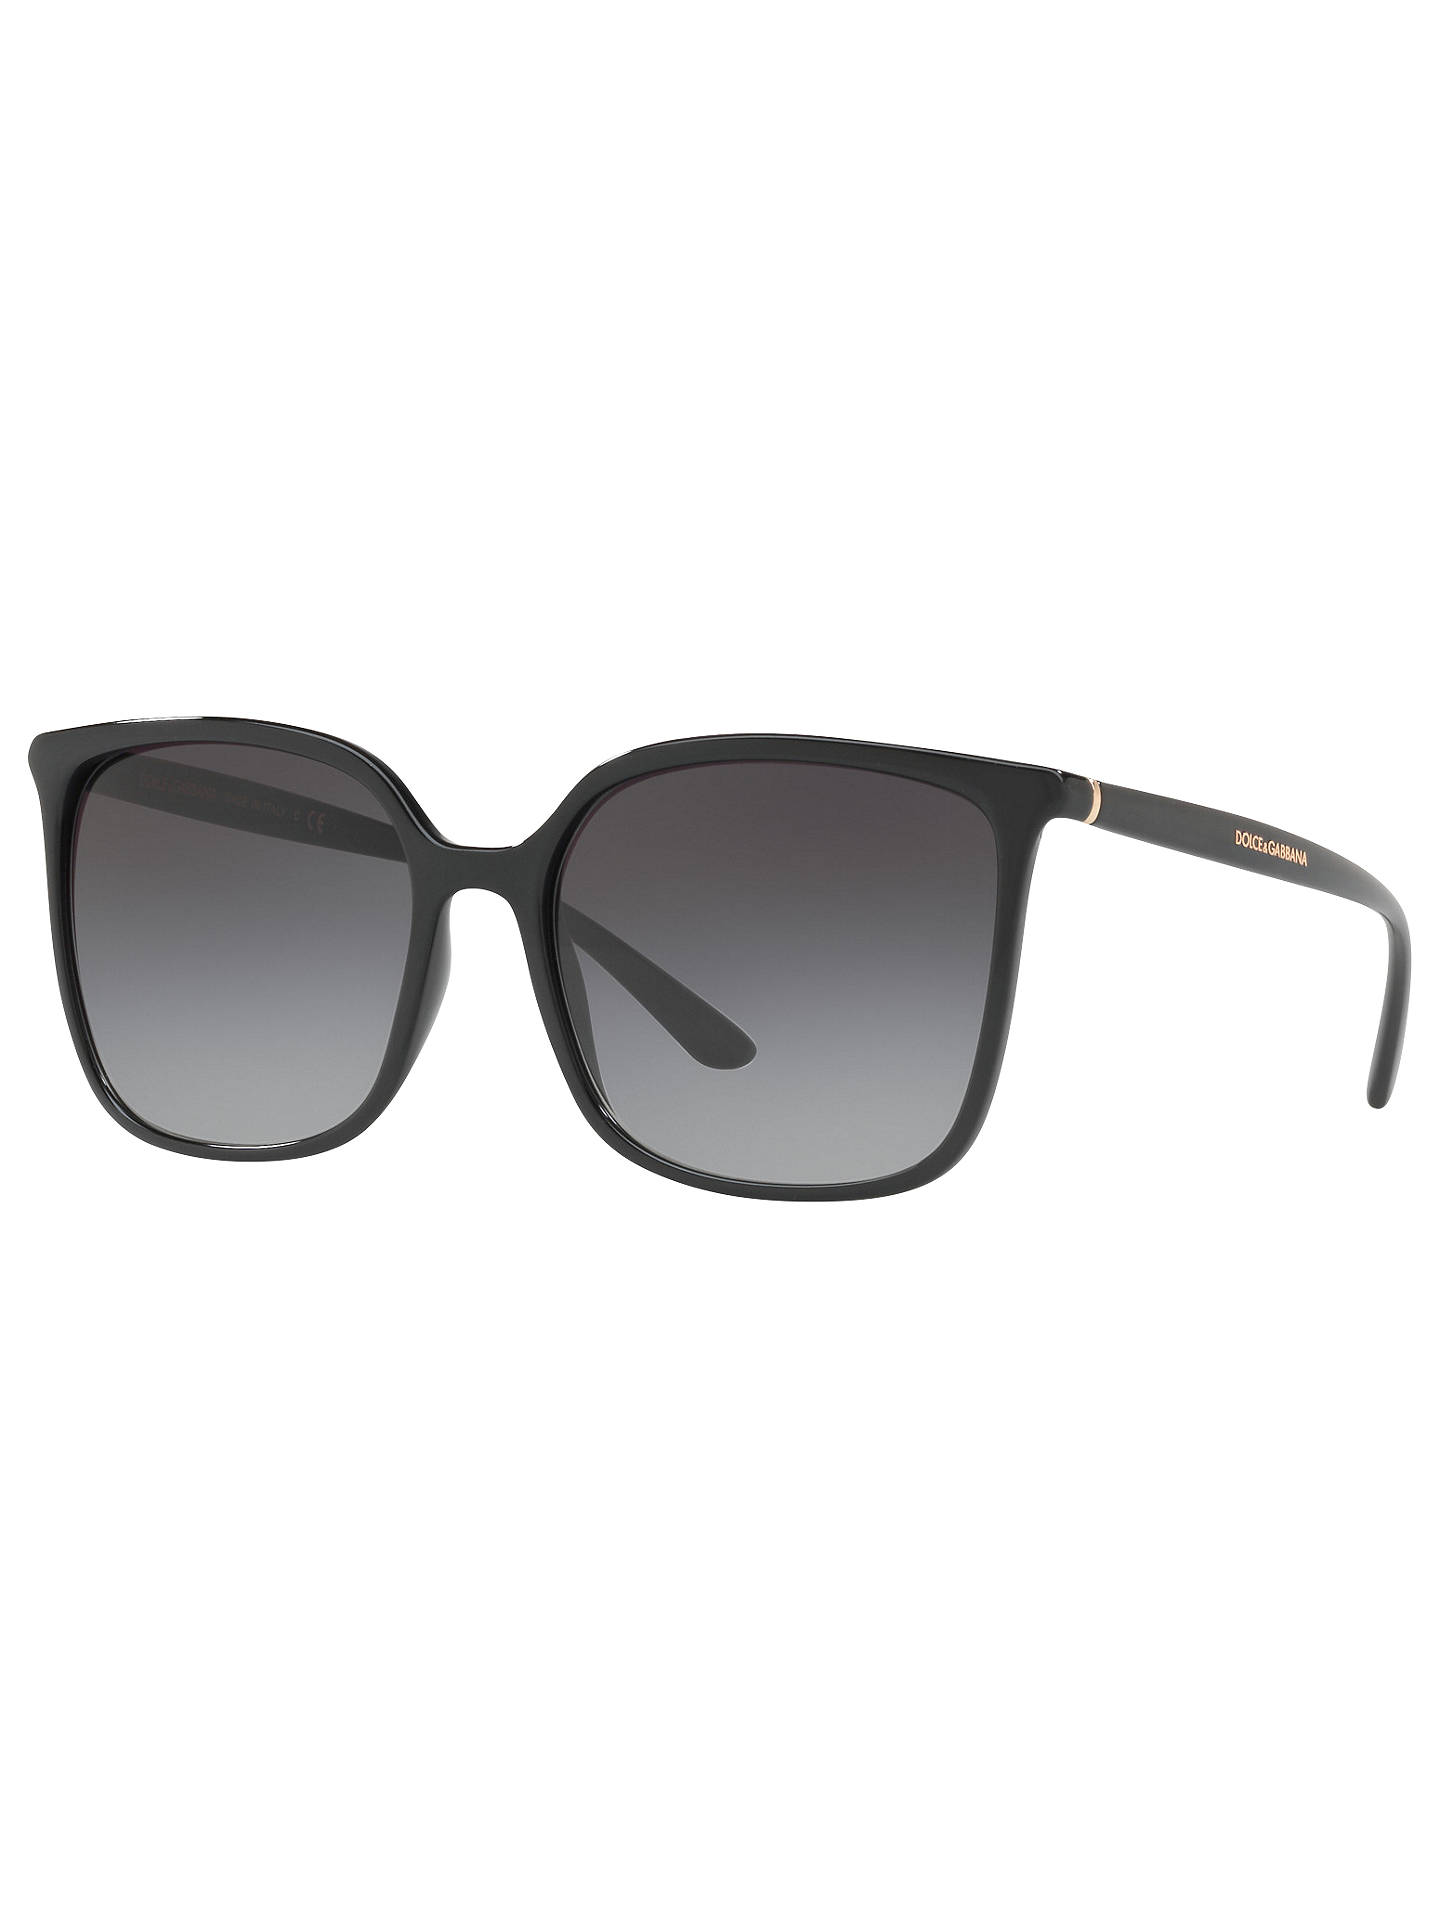 9946a2b63082 Buy Dolce   Gabbana DG6112 Square Sunglasses